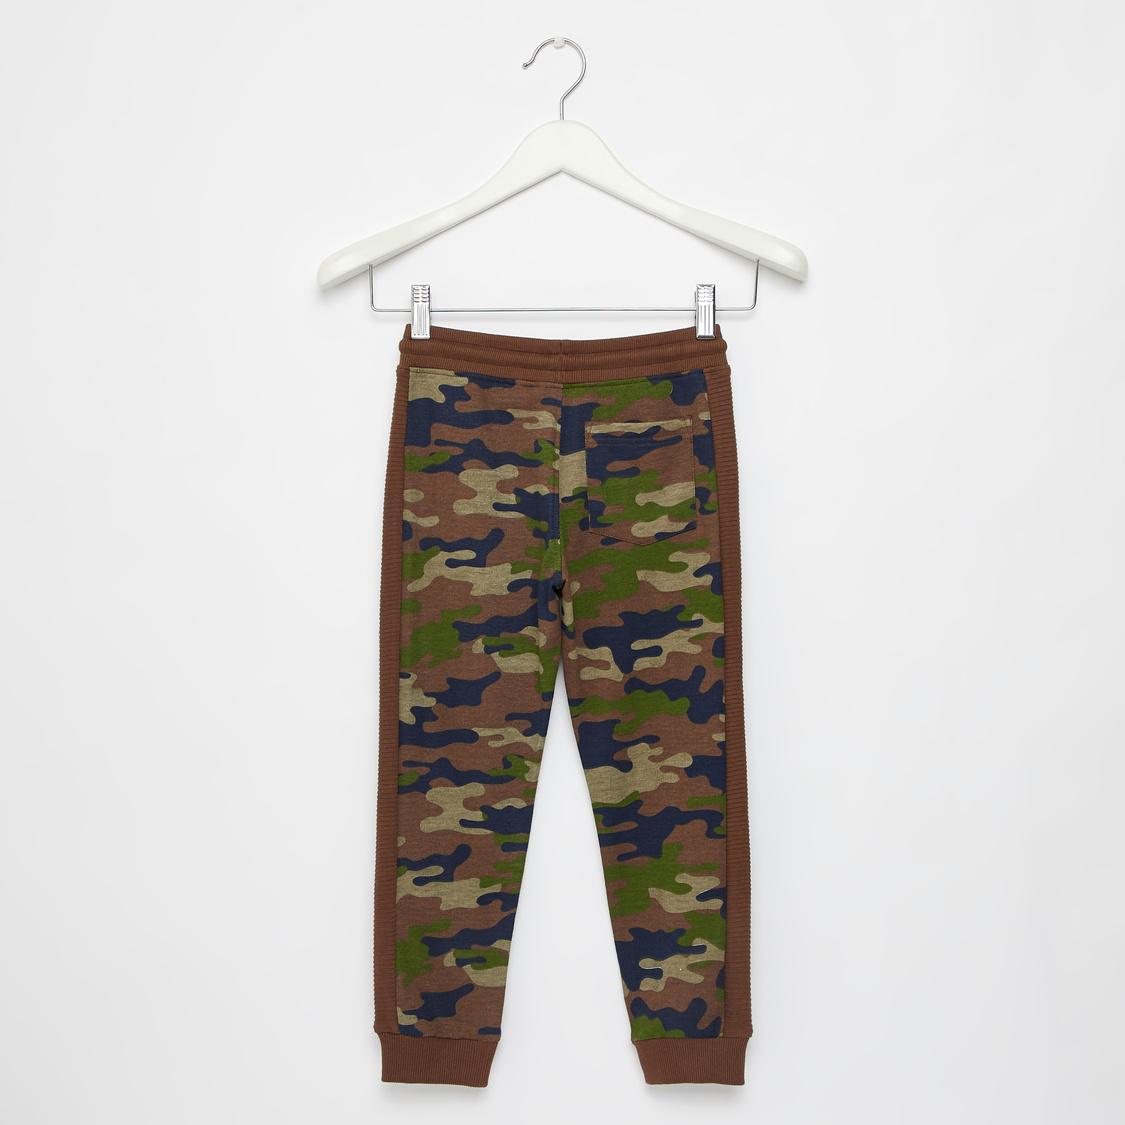 Full Length Camouflage Print Jog Pants with Drawstring Closure